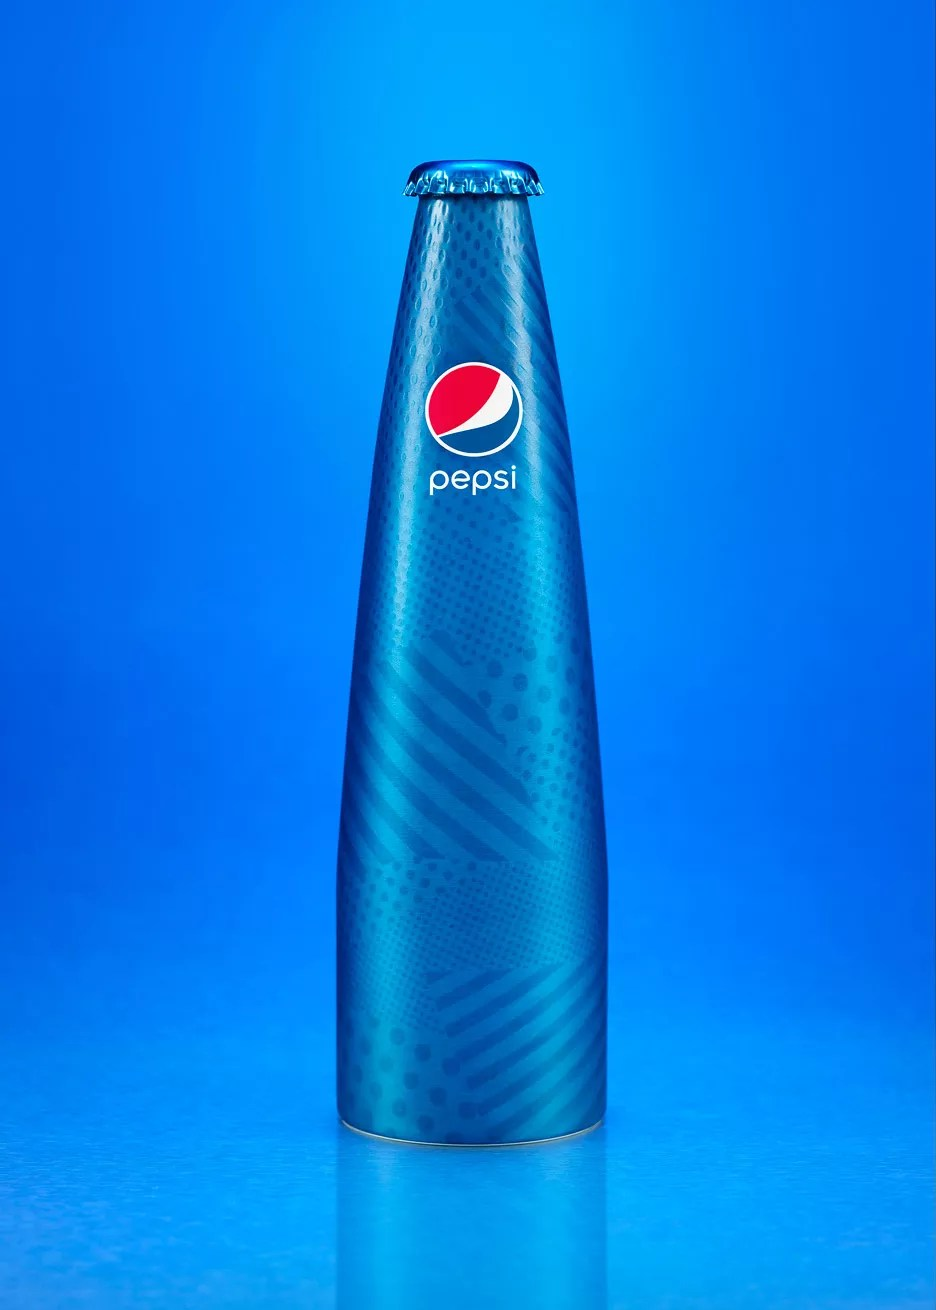 pepsi-prestige-bottles-accessories-1